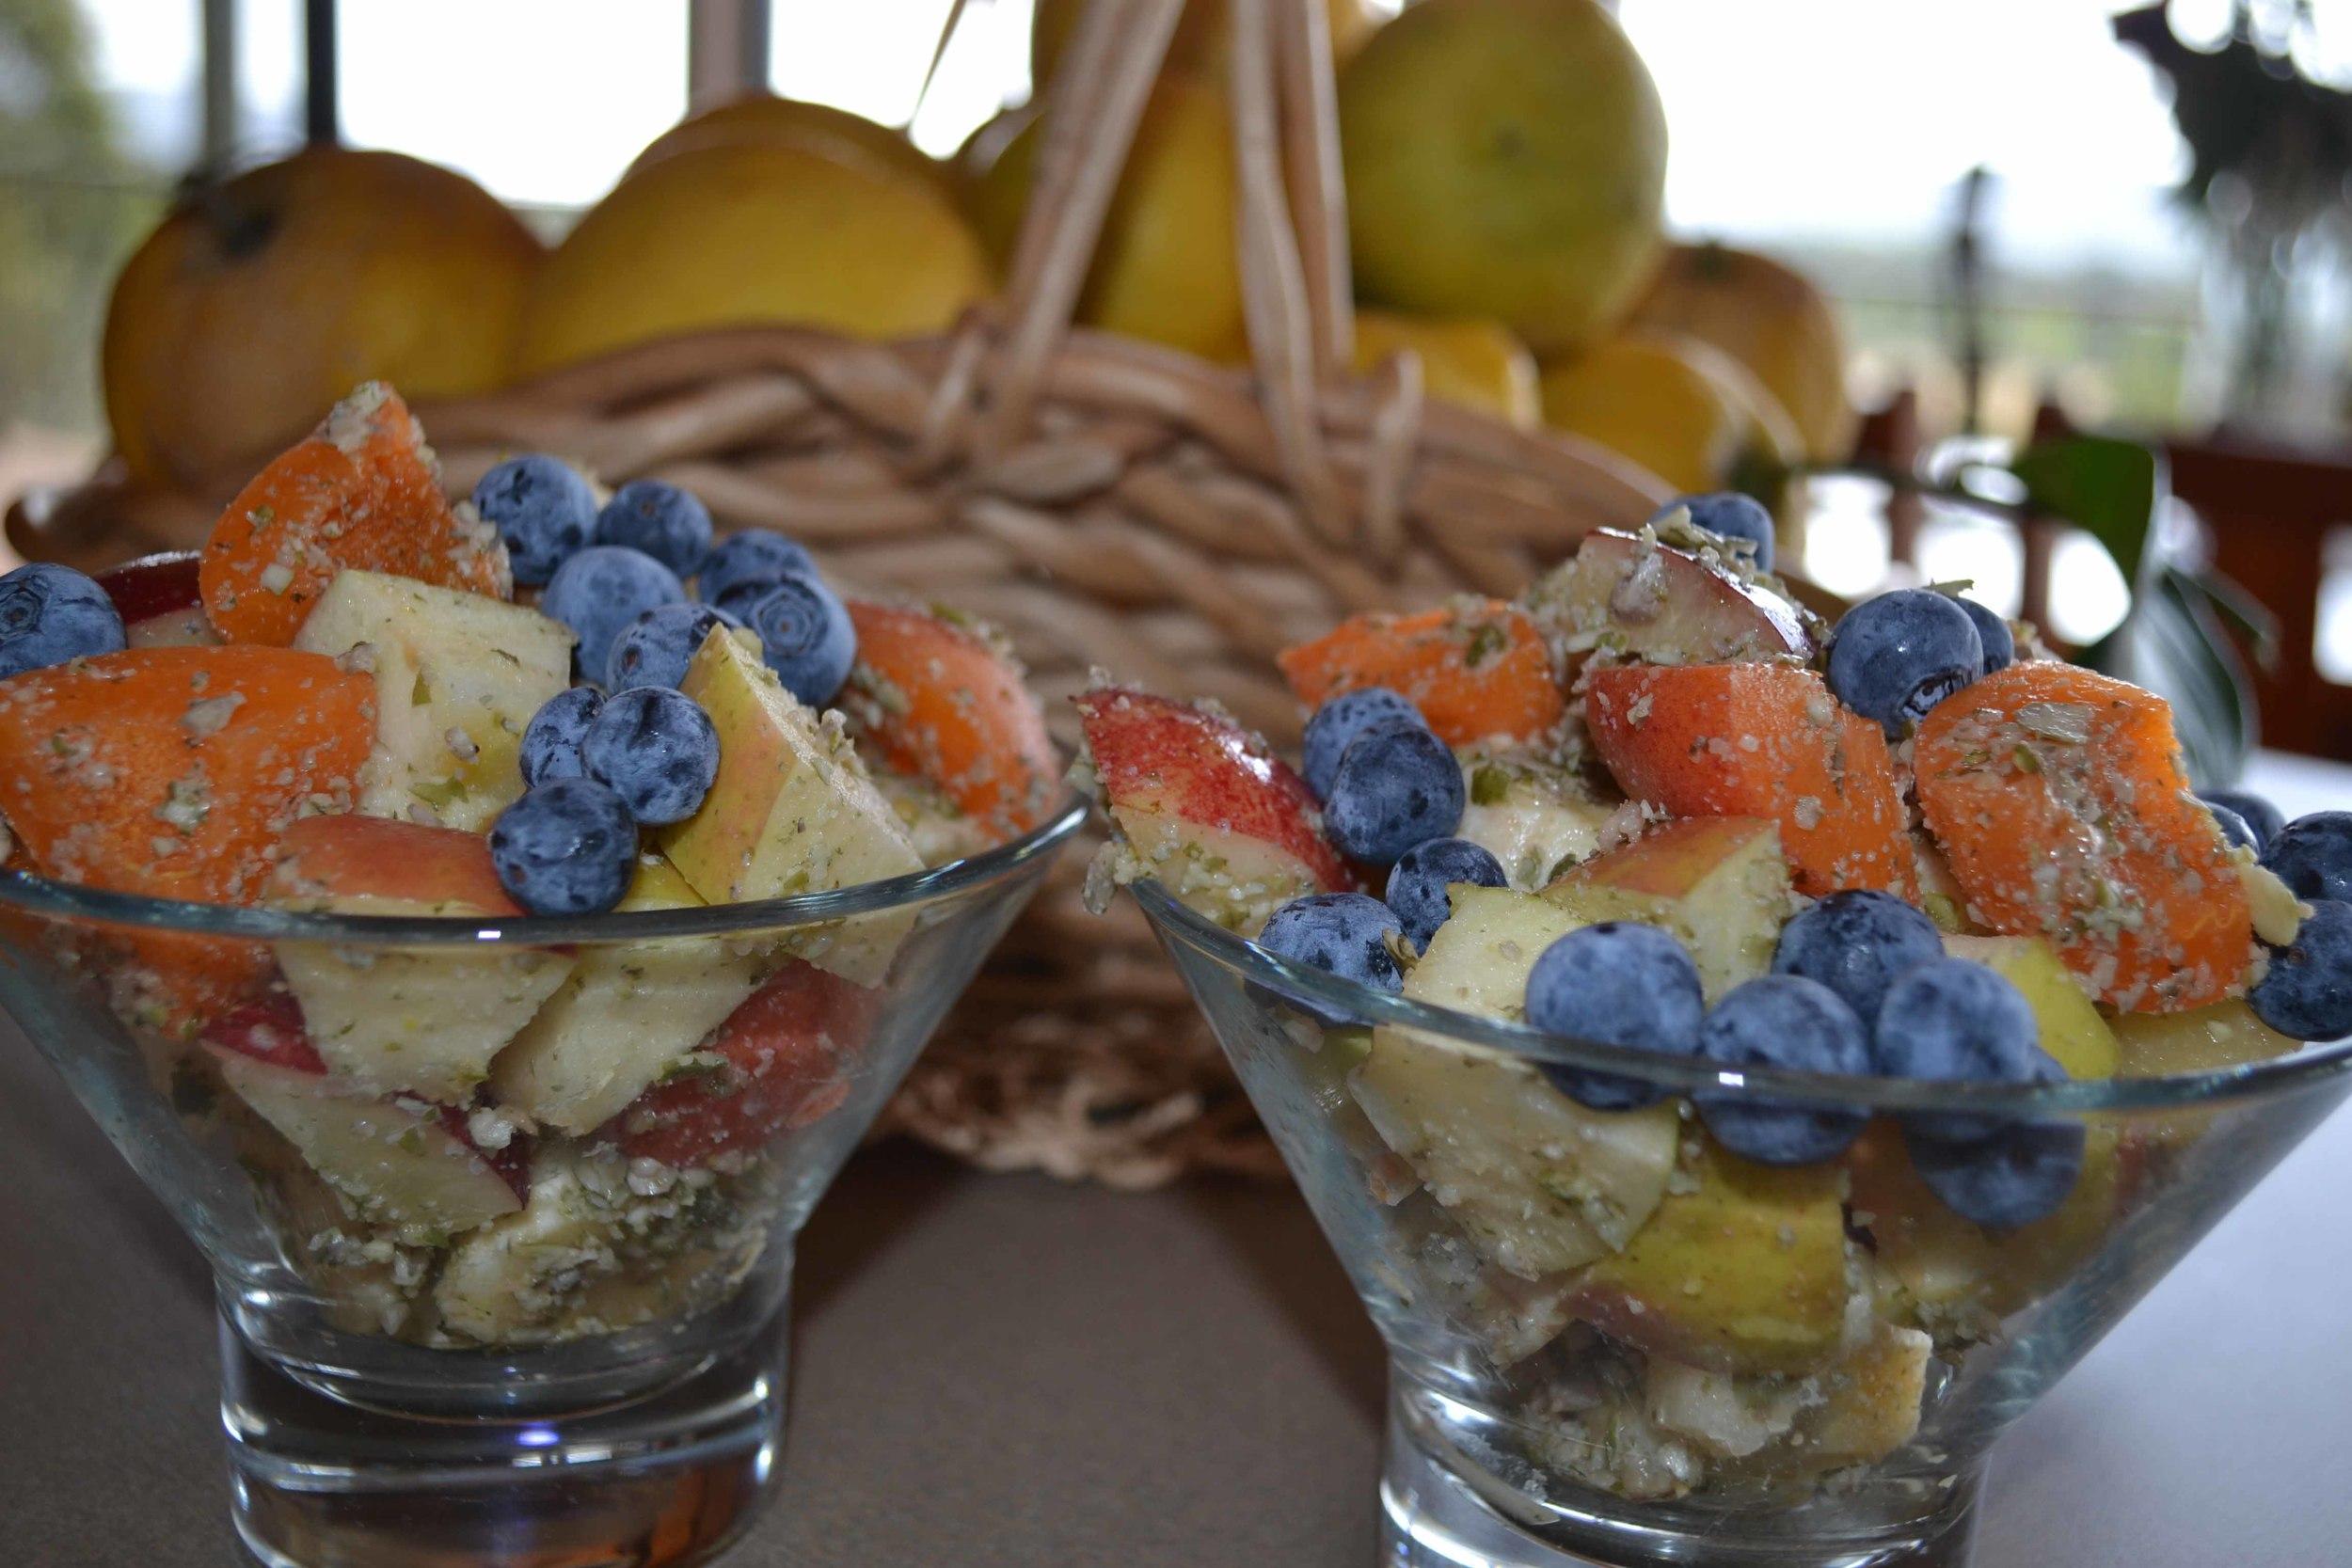 fruit salad lo res.jpg